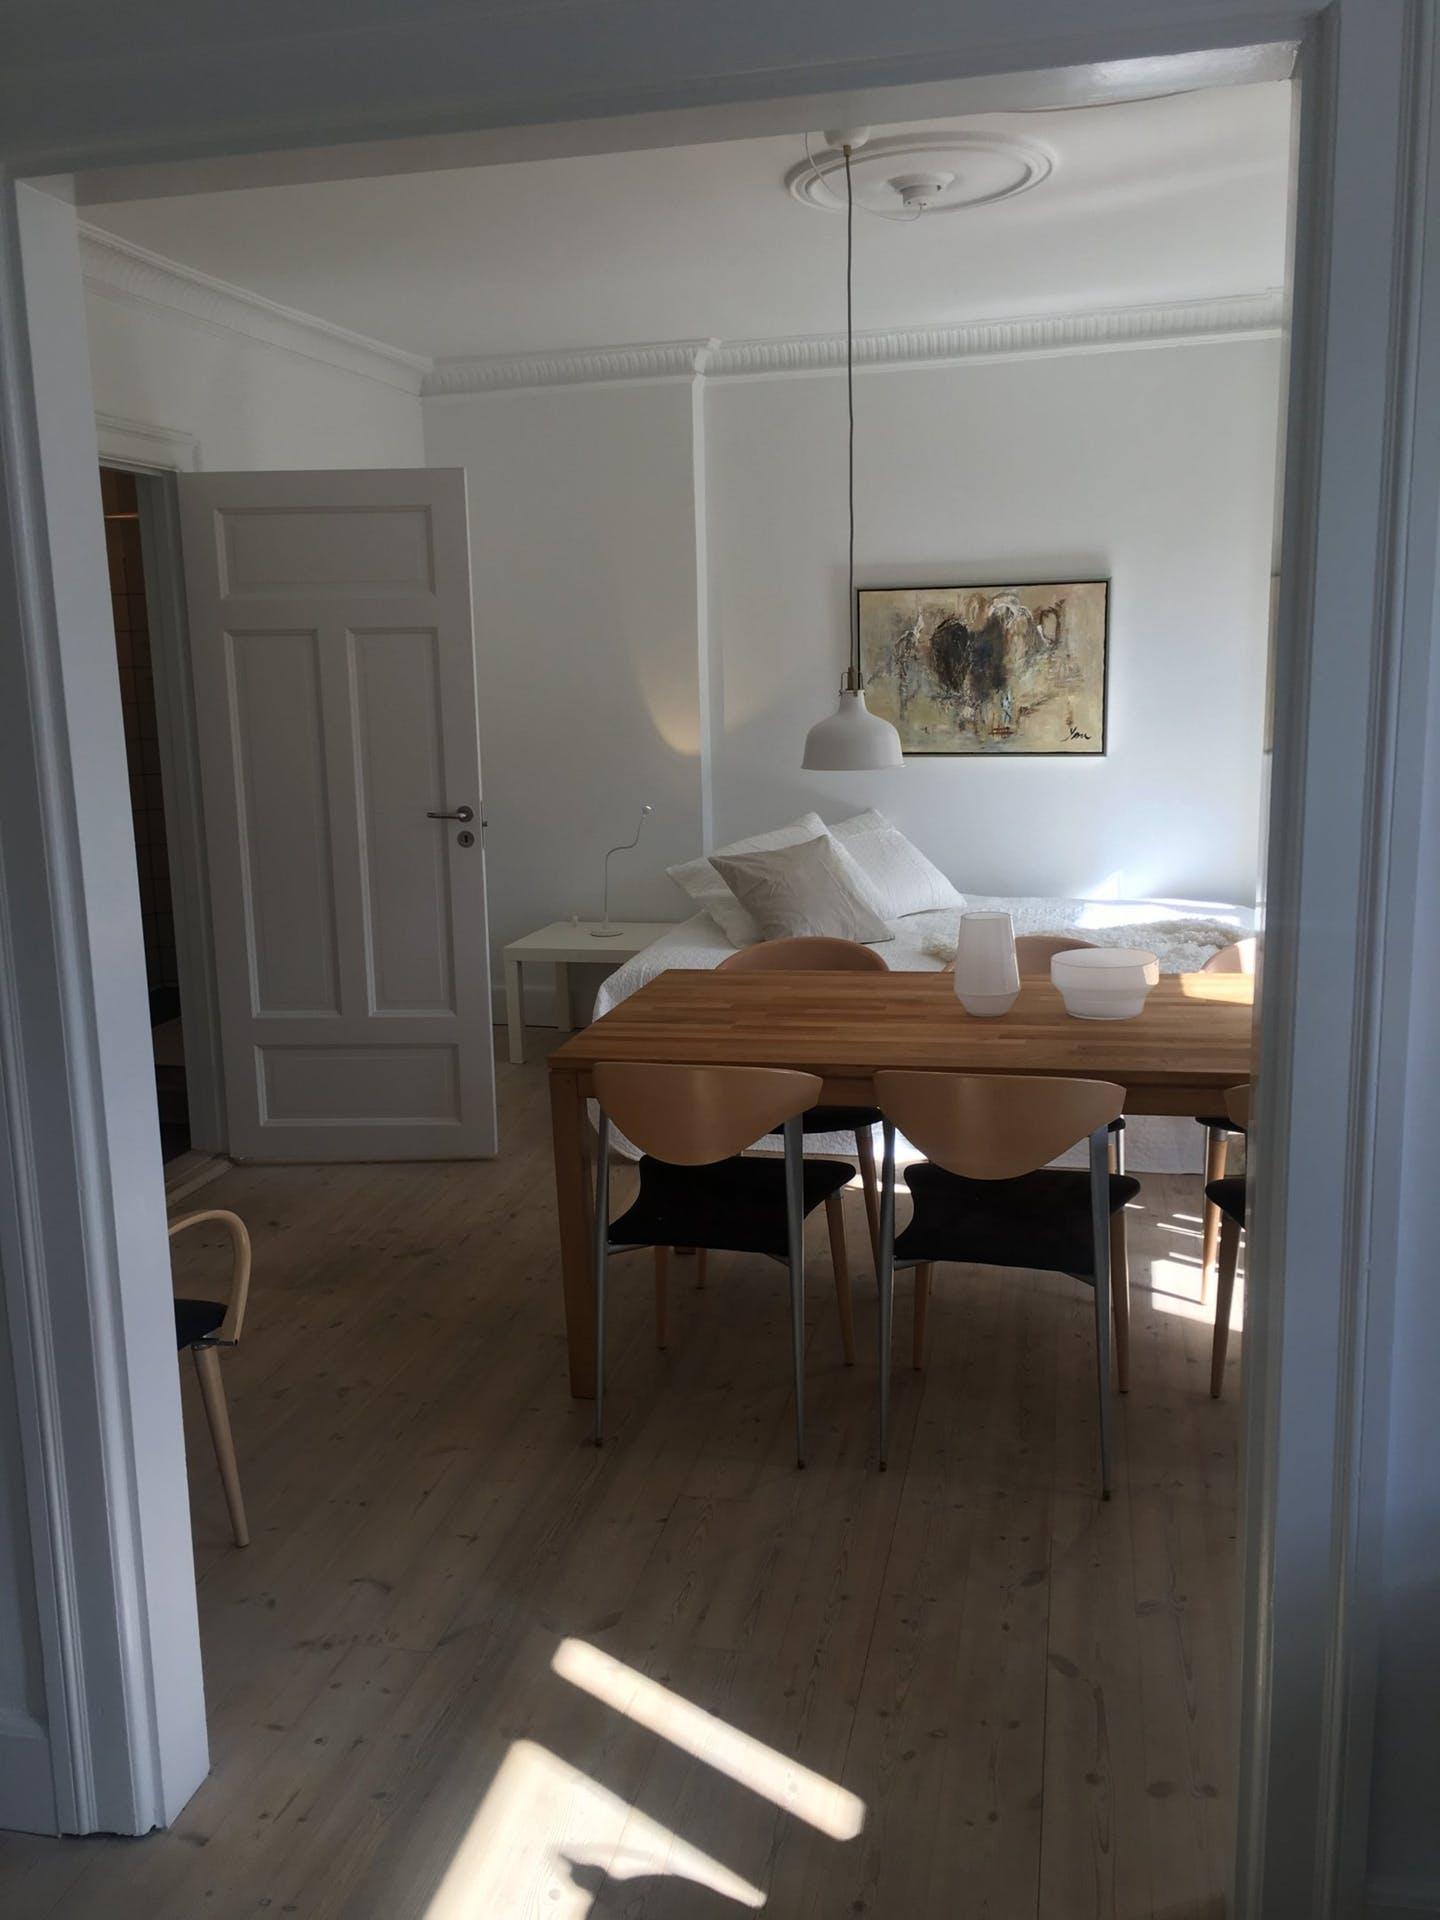 Dining area at Nørrebrogade Apartments, Nørrebro, Copenhagen